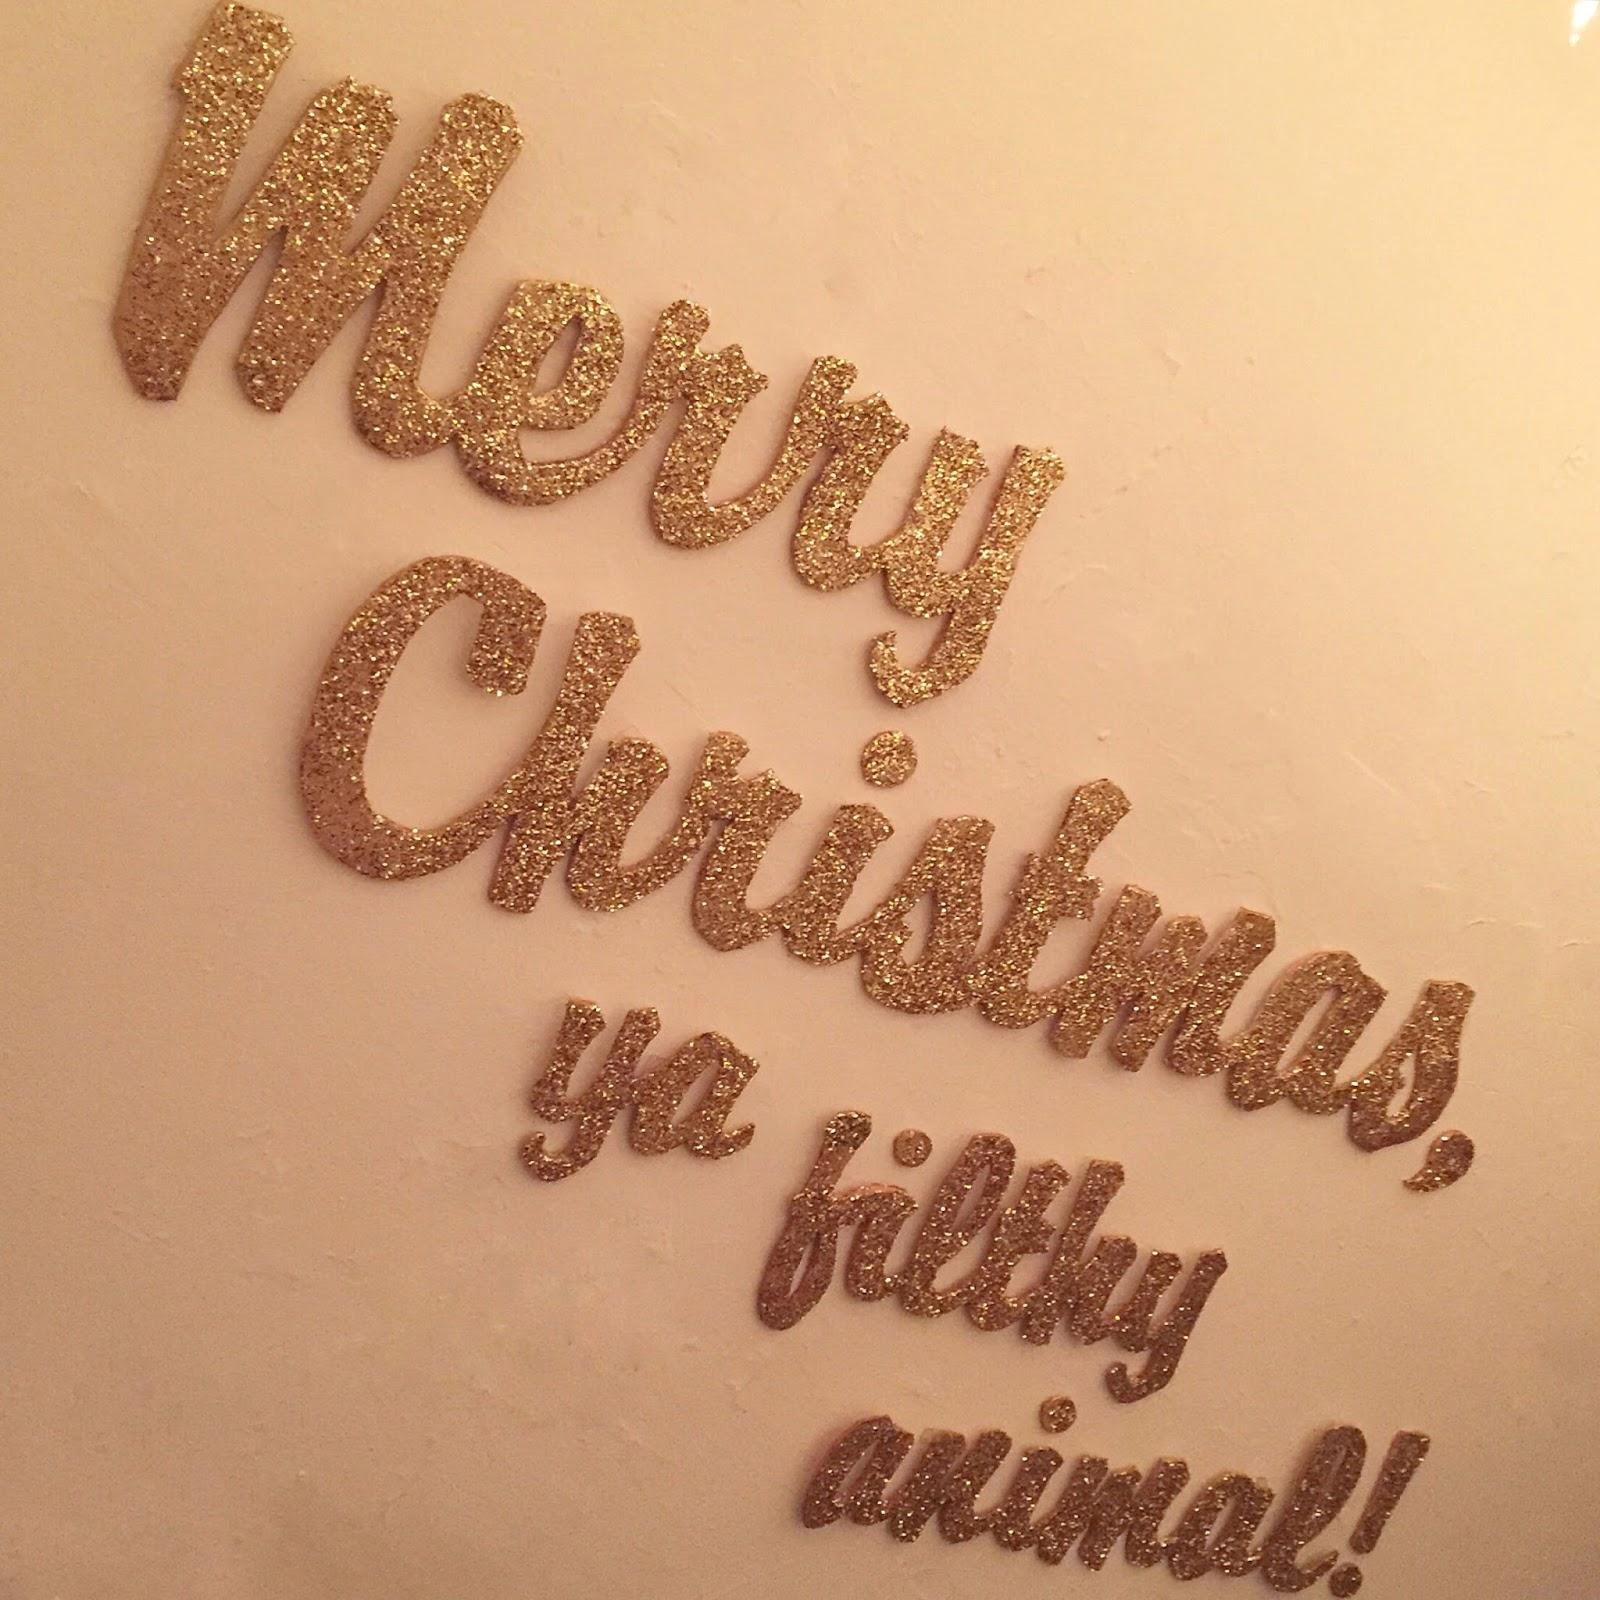 Crafty Lumberjacks: Merry Christmas, Ya Filthy Animal!